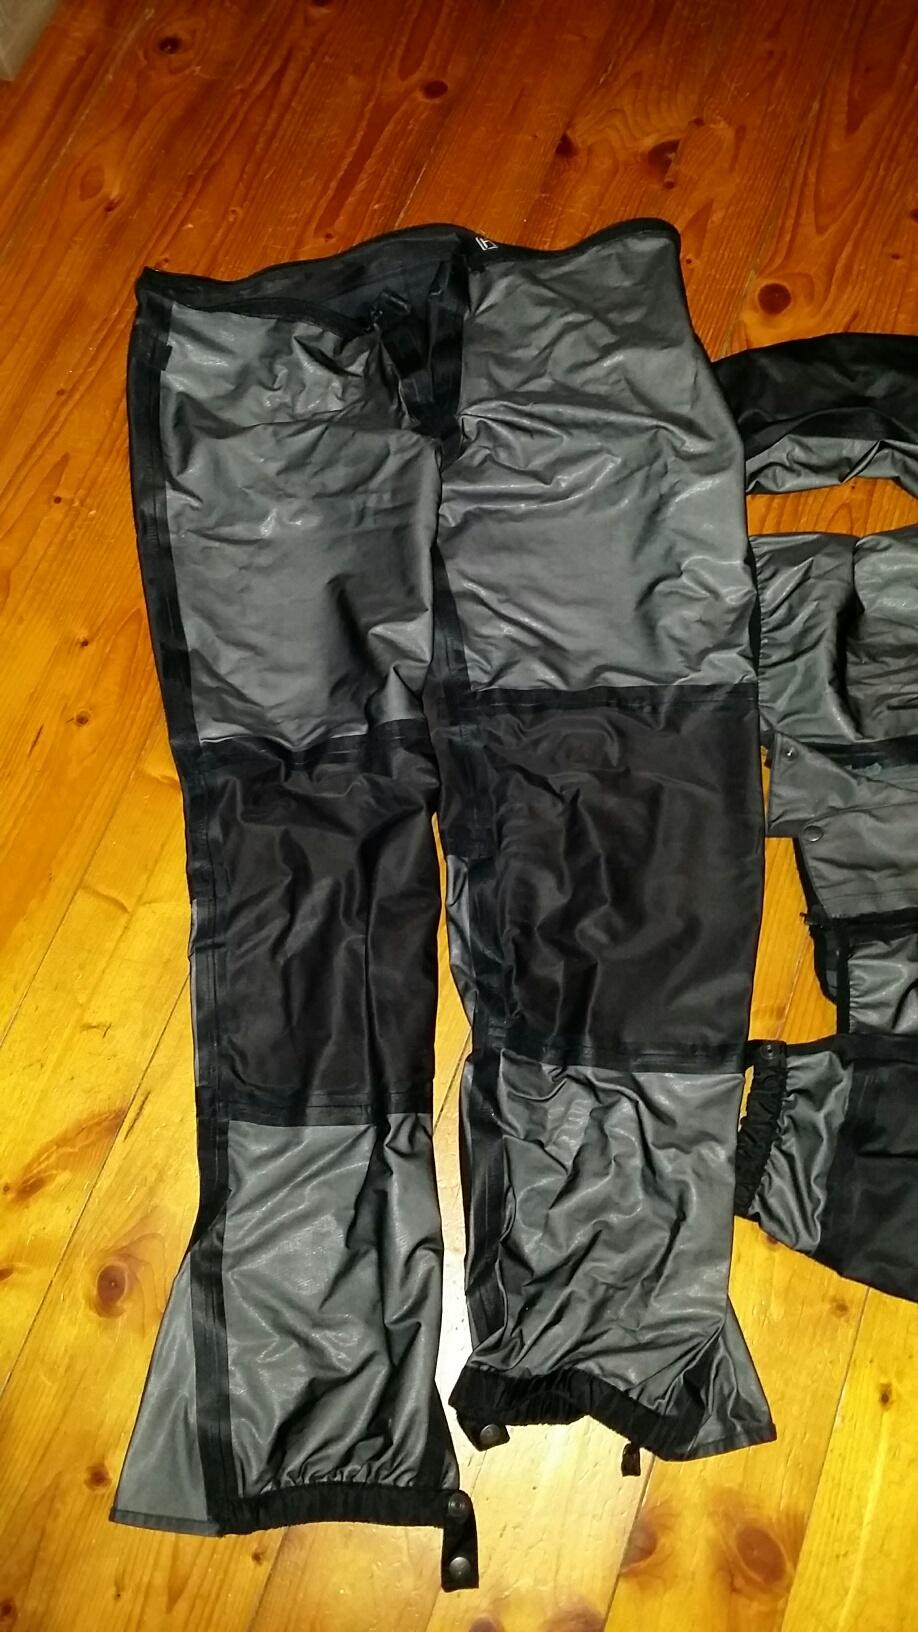 erledigt bmw rallye 3 anzug kplt jacke hose inlet. Black Bedroom Furniture Sets. Home Design Ideas